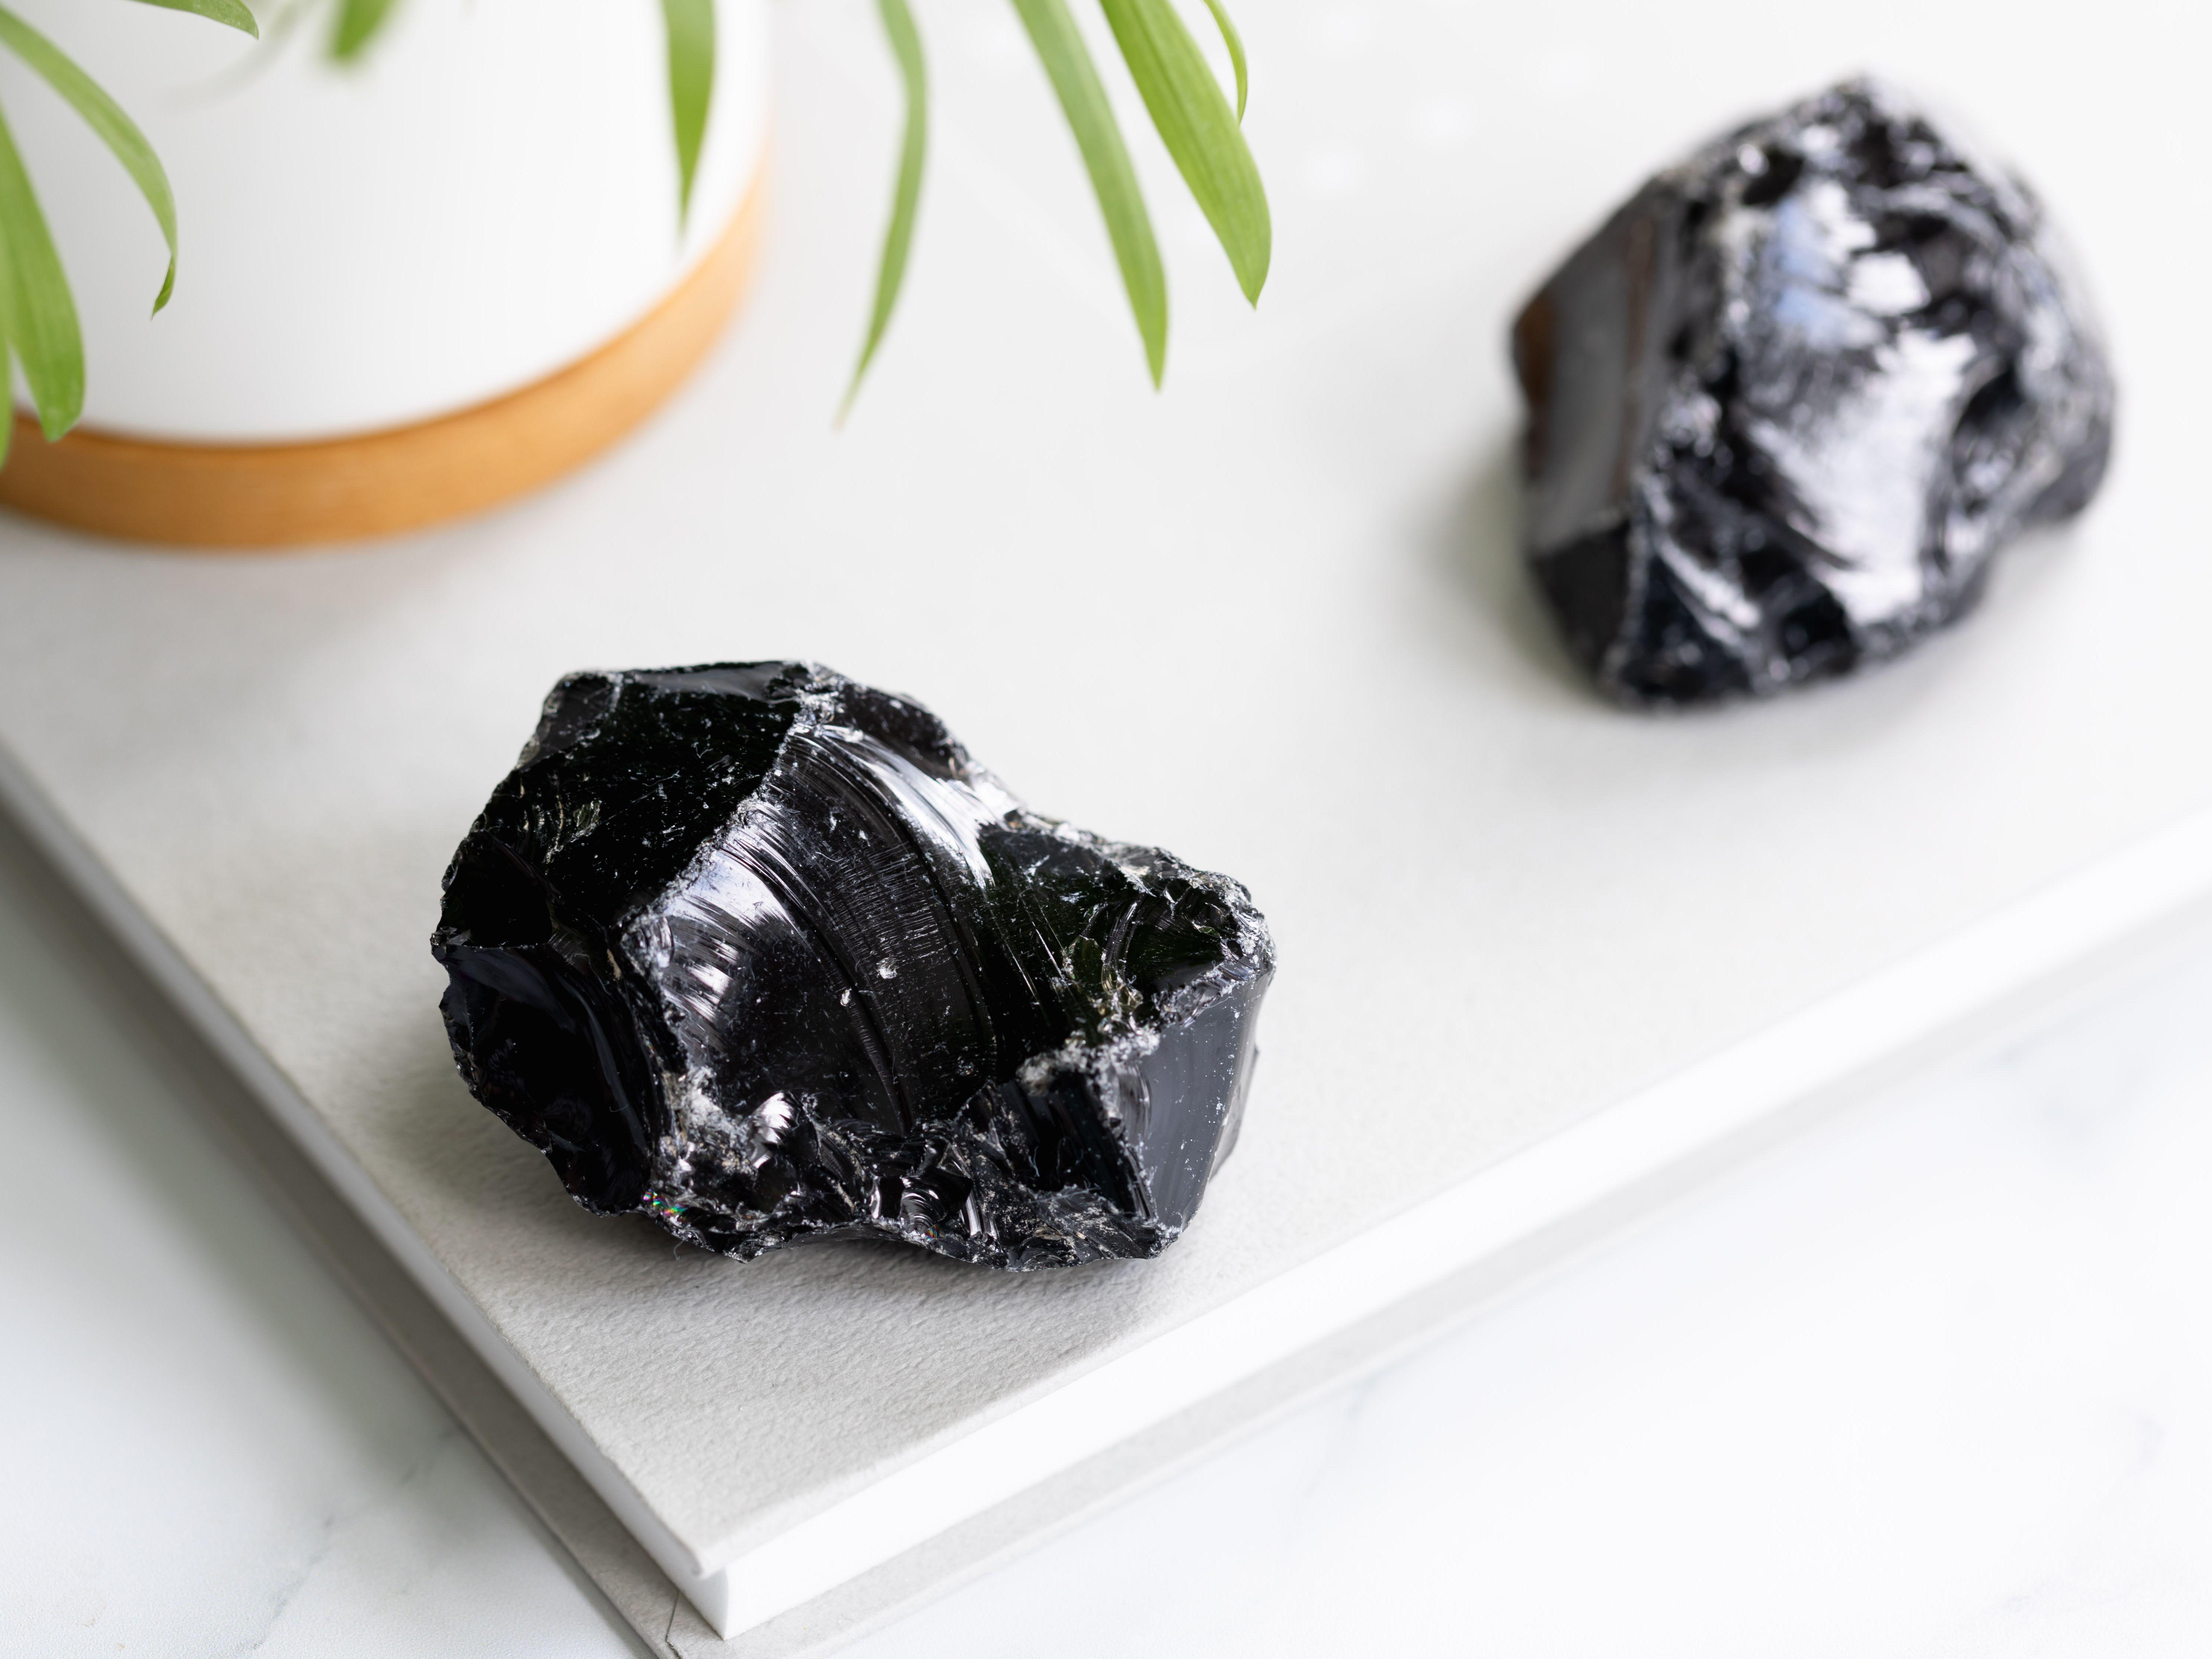 Rocks and Minerals,Grounding Stone,Chakra Healing,Rocks and Crystals,Obsidian Stone Mahogany Obsidian Crystal,Rough Mahogany Obsidian Stone